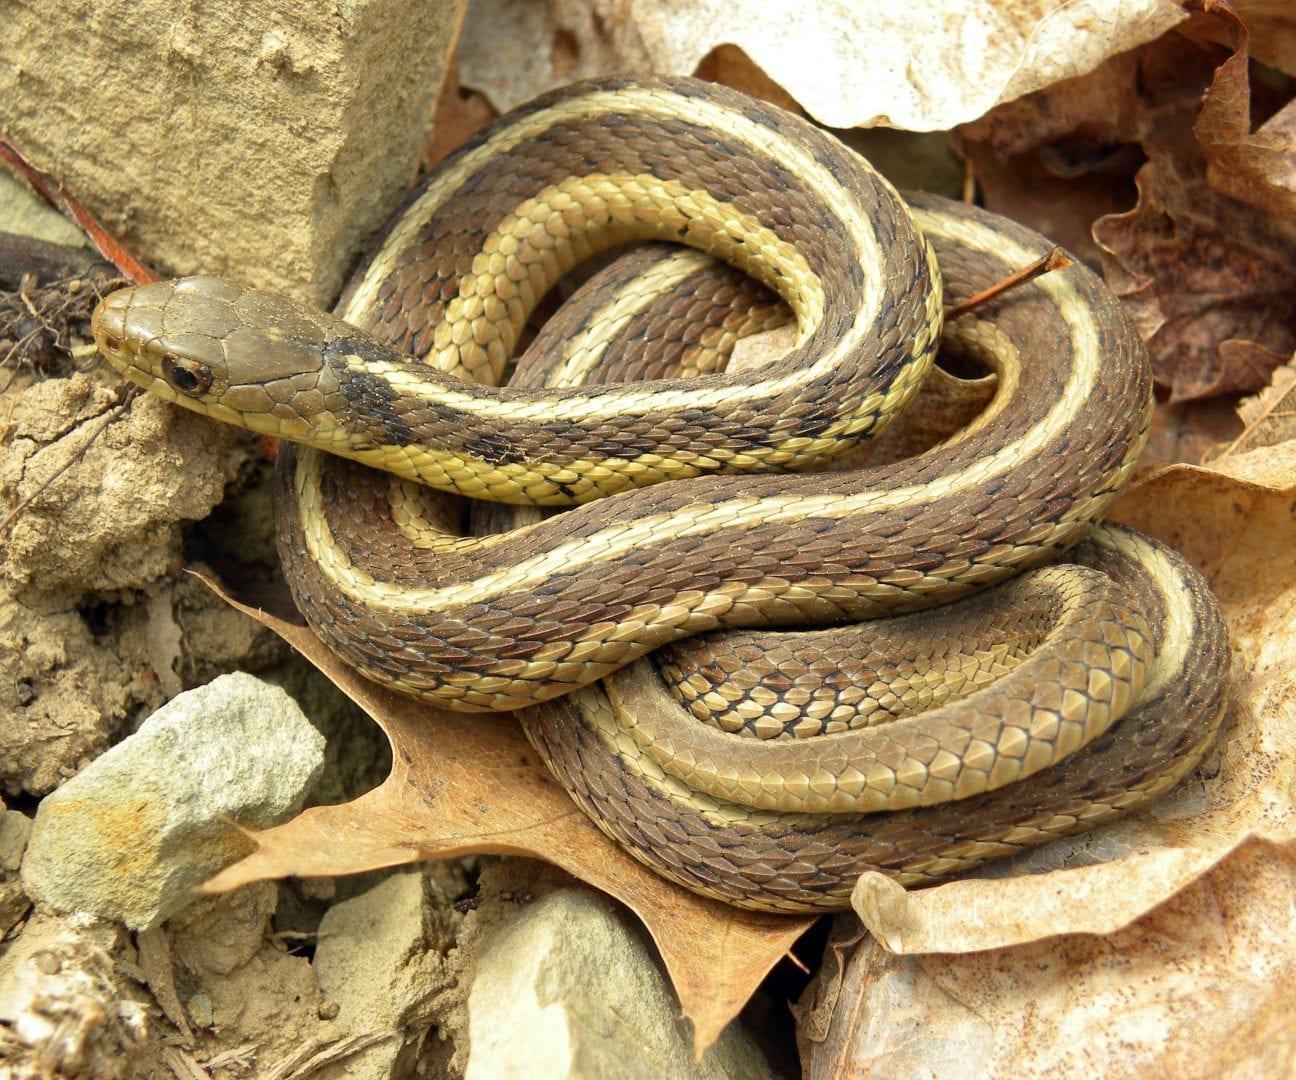 how to keep garter snakes away